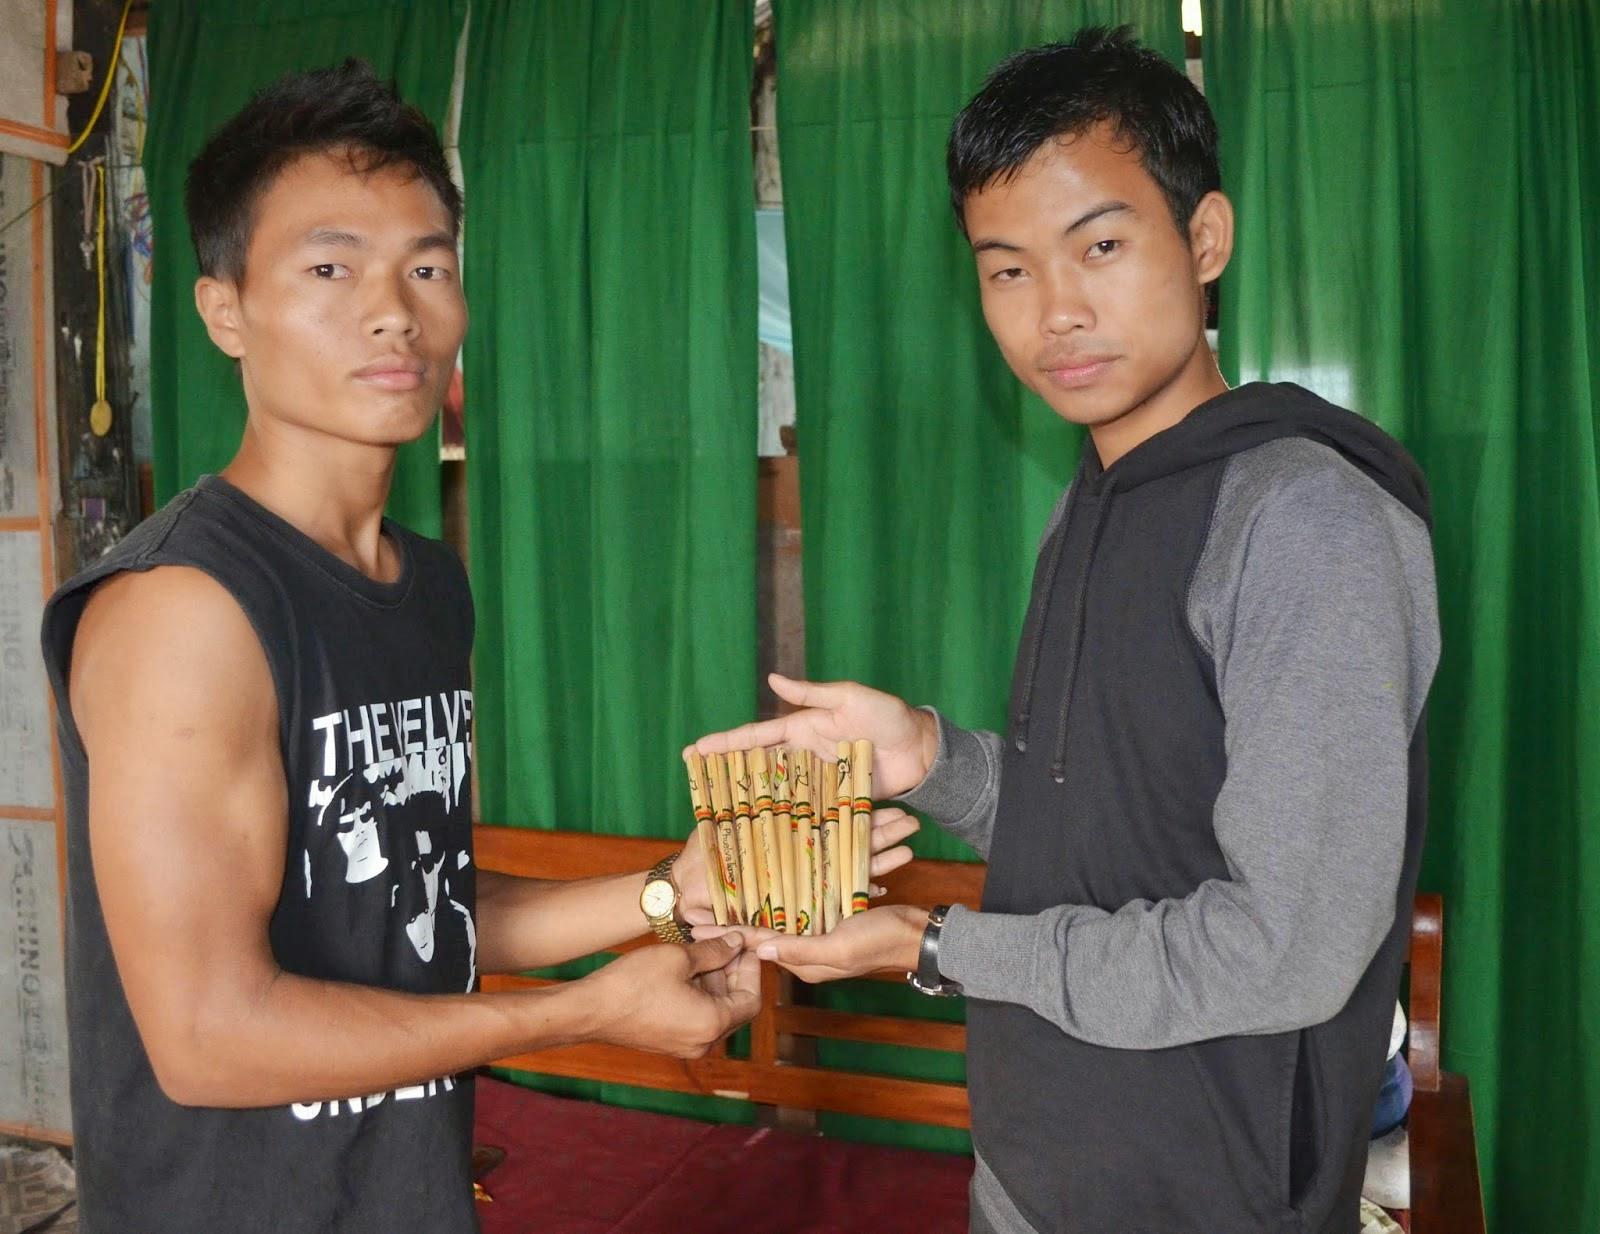 Manipur Express | December 18, 2014